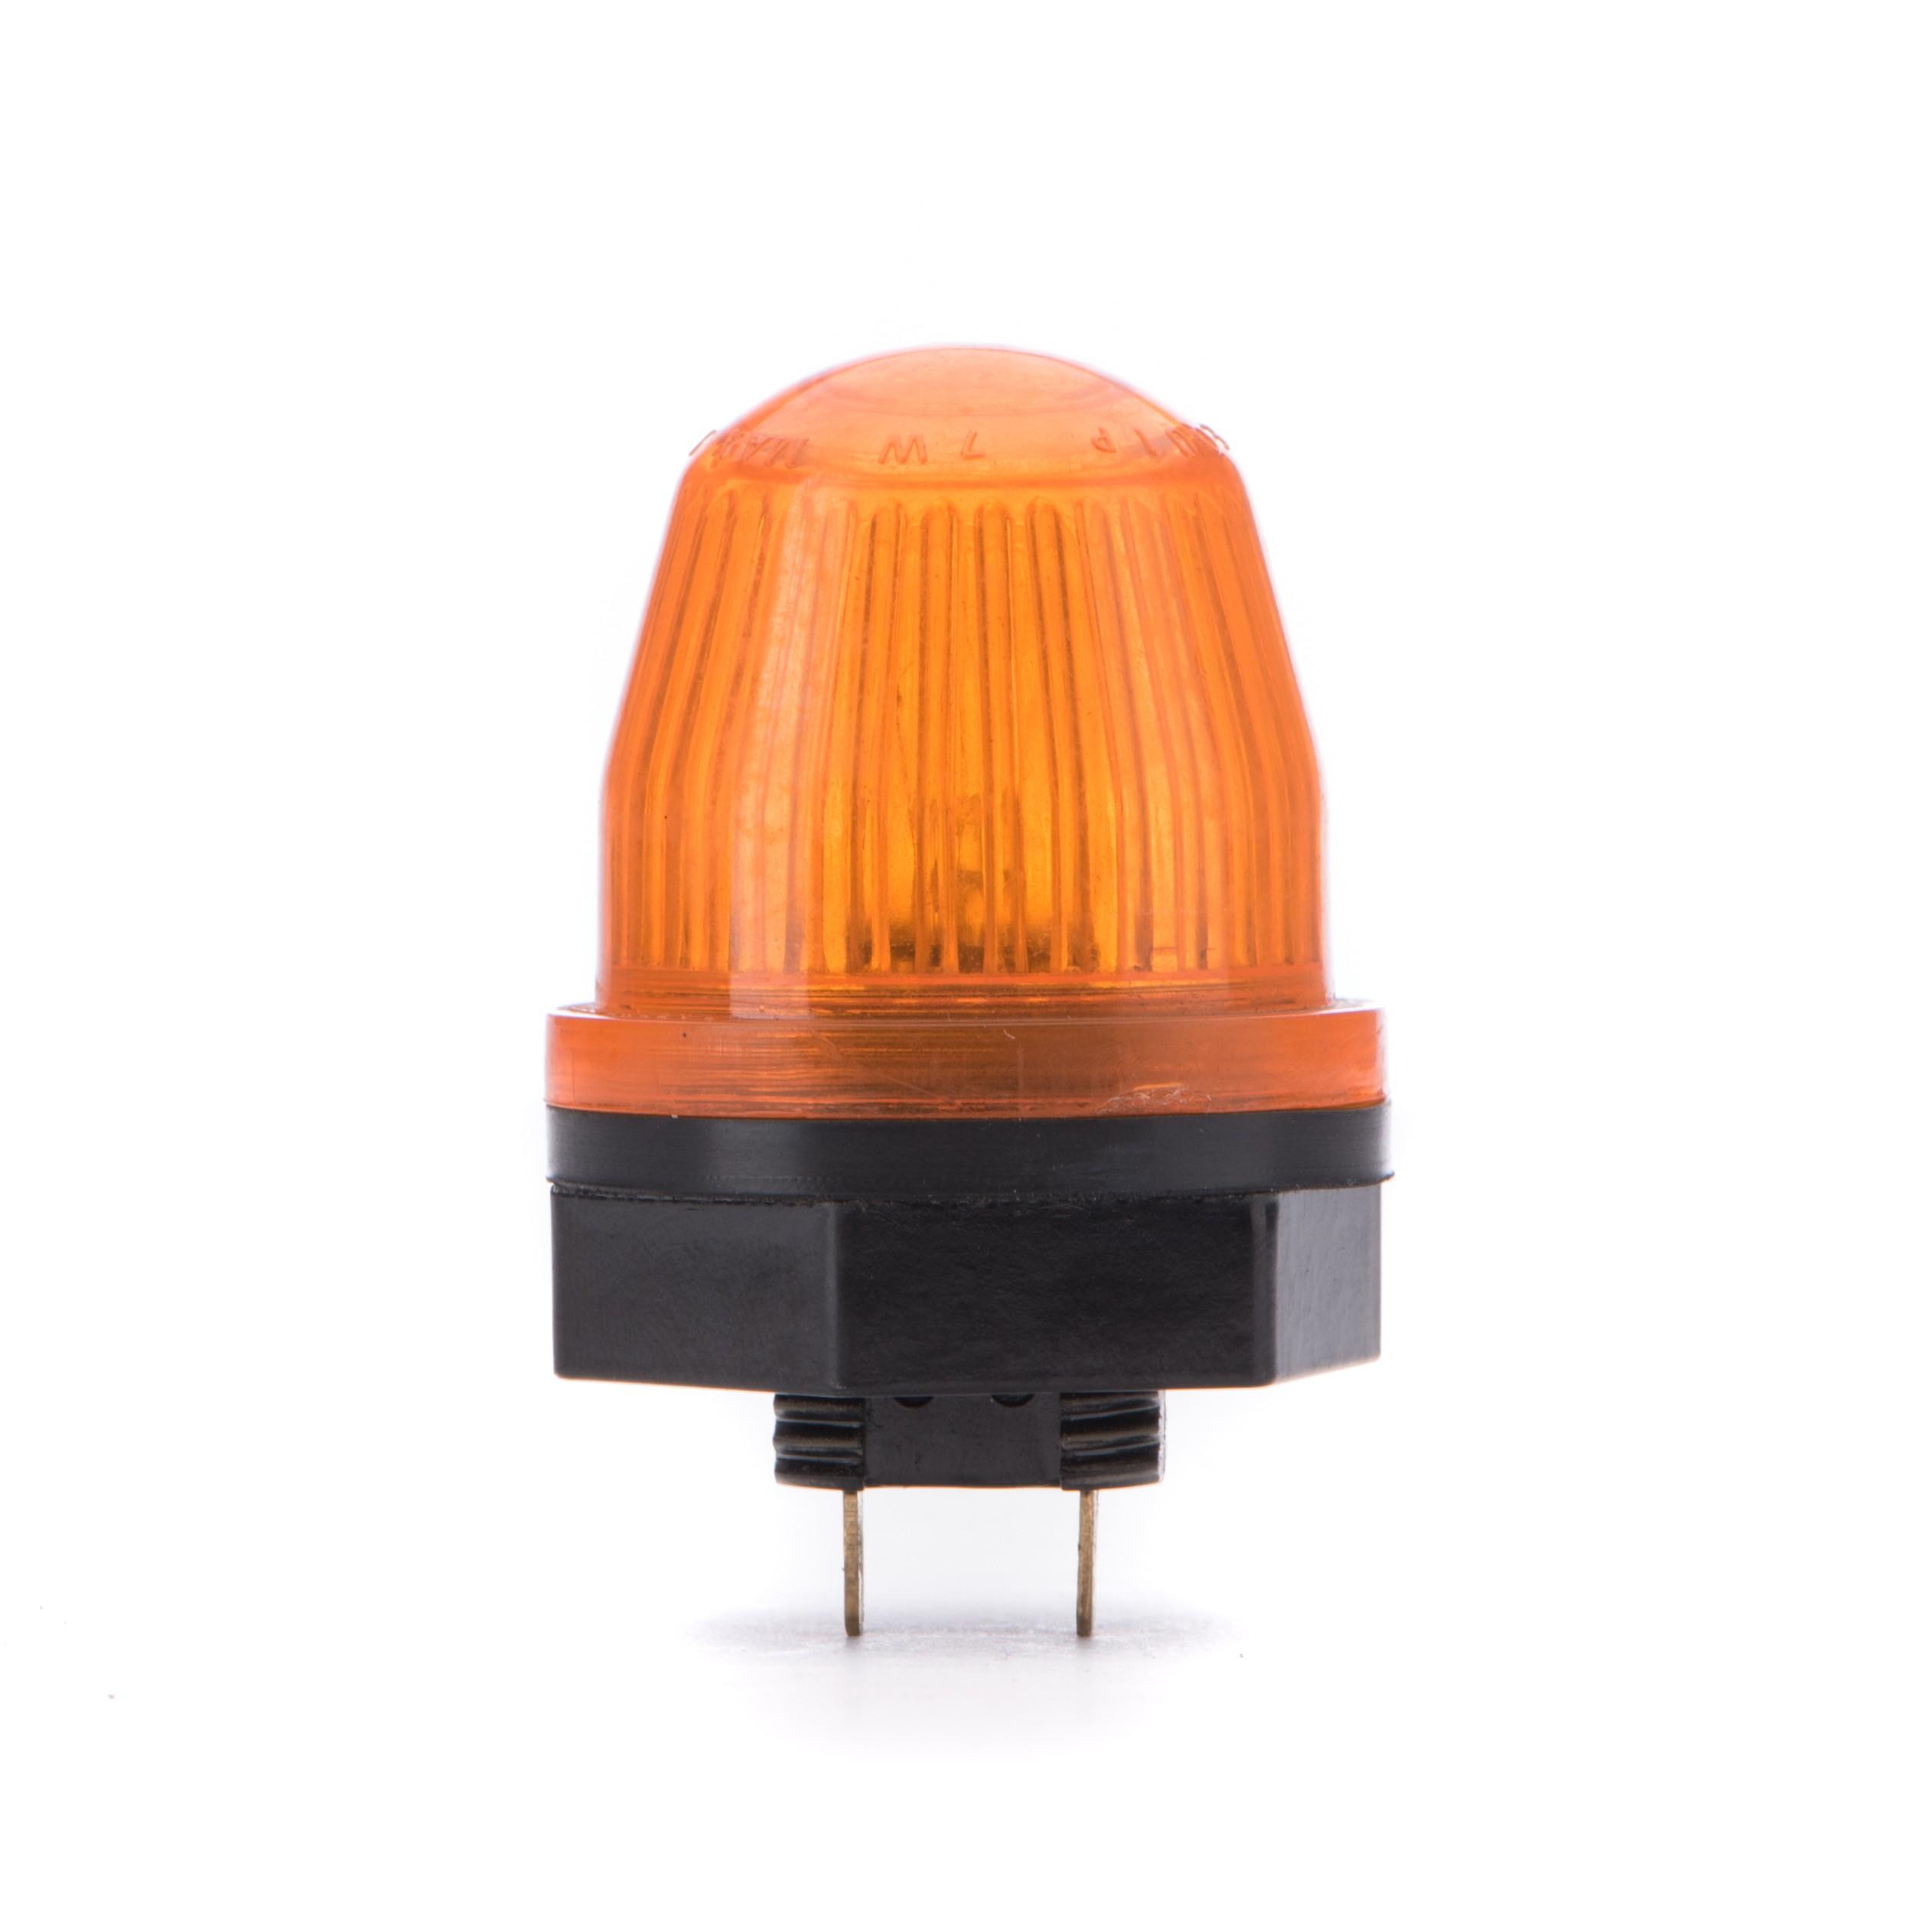 SPI Amber Alarm Light Assembly For Control Panels